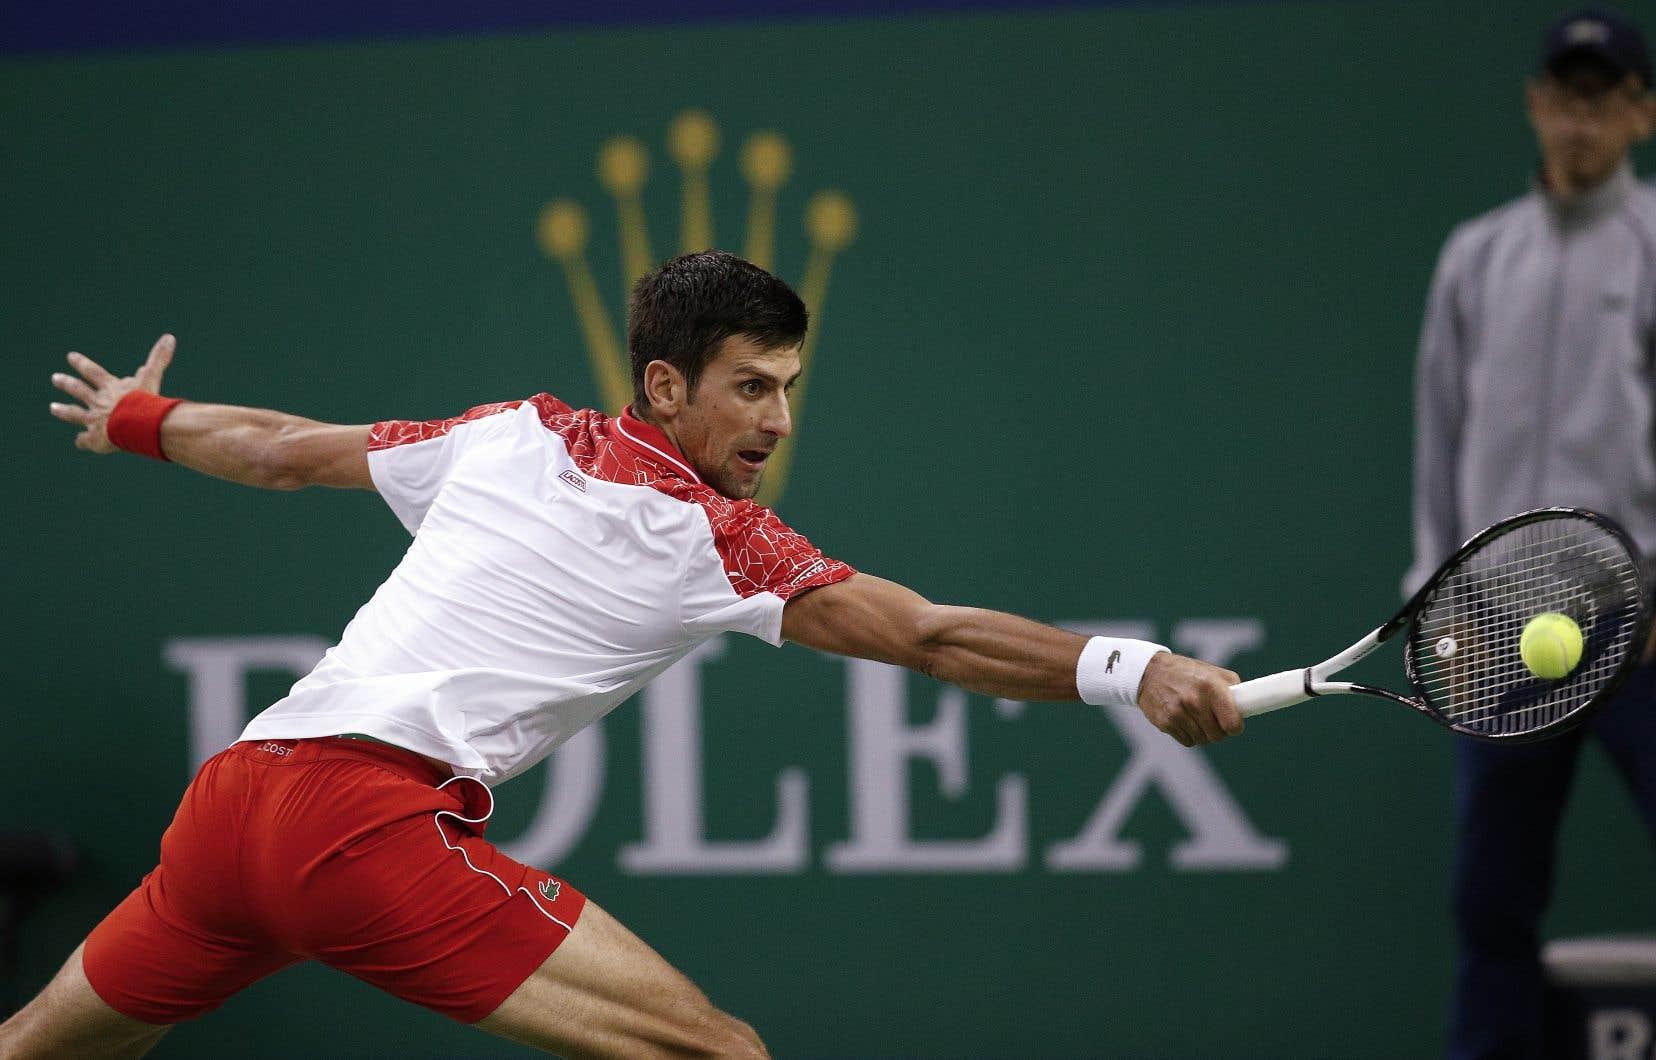 Novak Djokovic retournant un service du Croate Borna Coric lors du match de la finale, dimanche